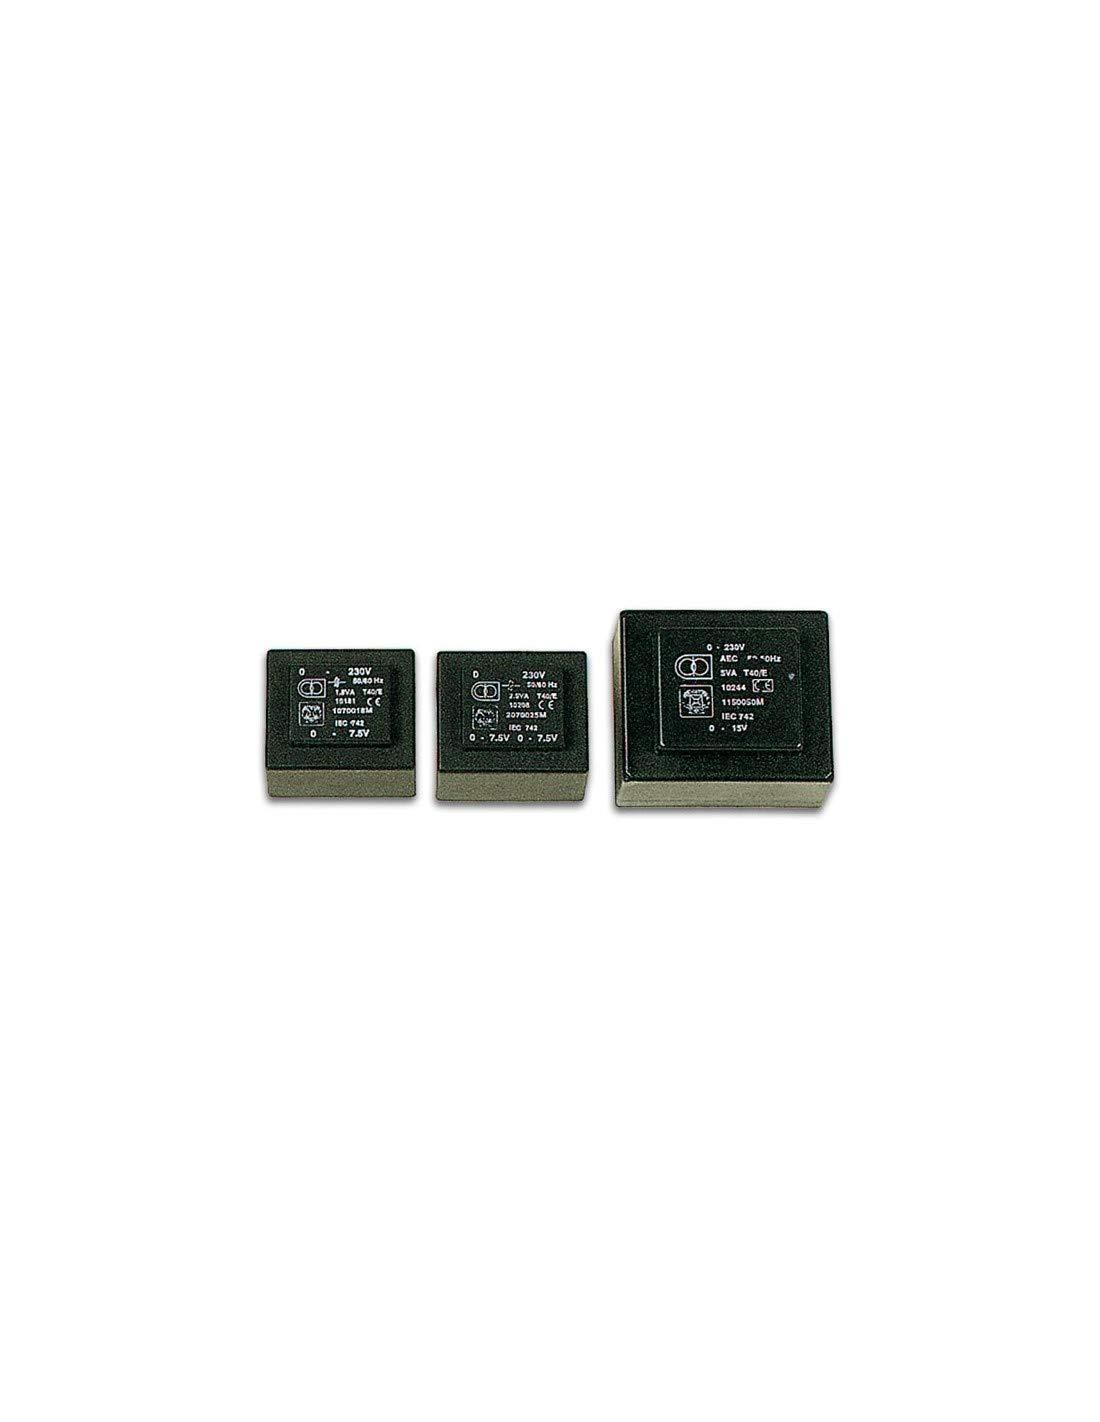 Velleman 138786 Printtrafo, 3.8VA, 1 x 6V, 1 x 0.633 Amp